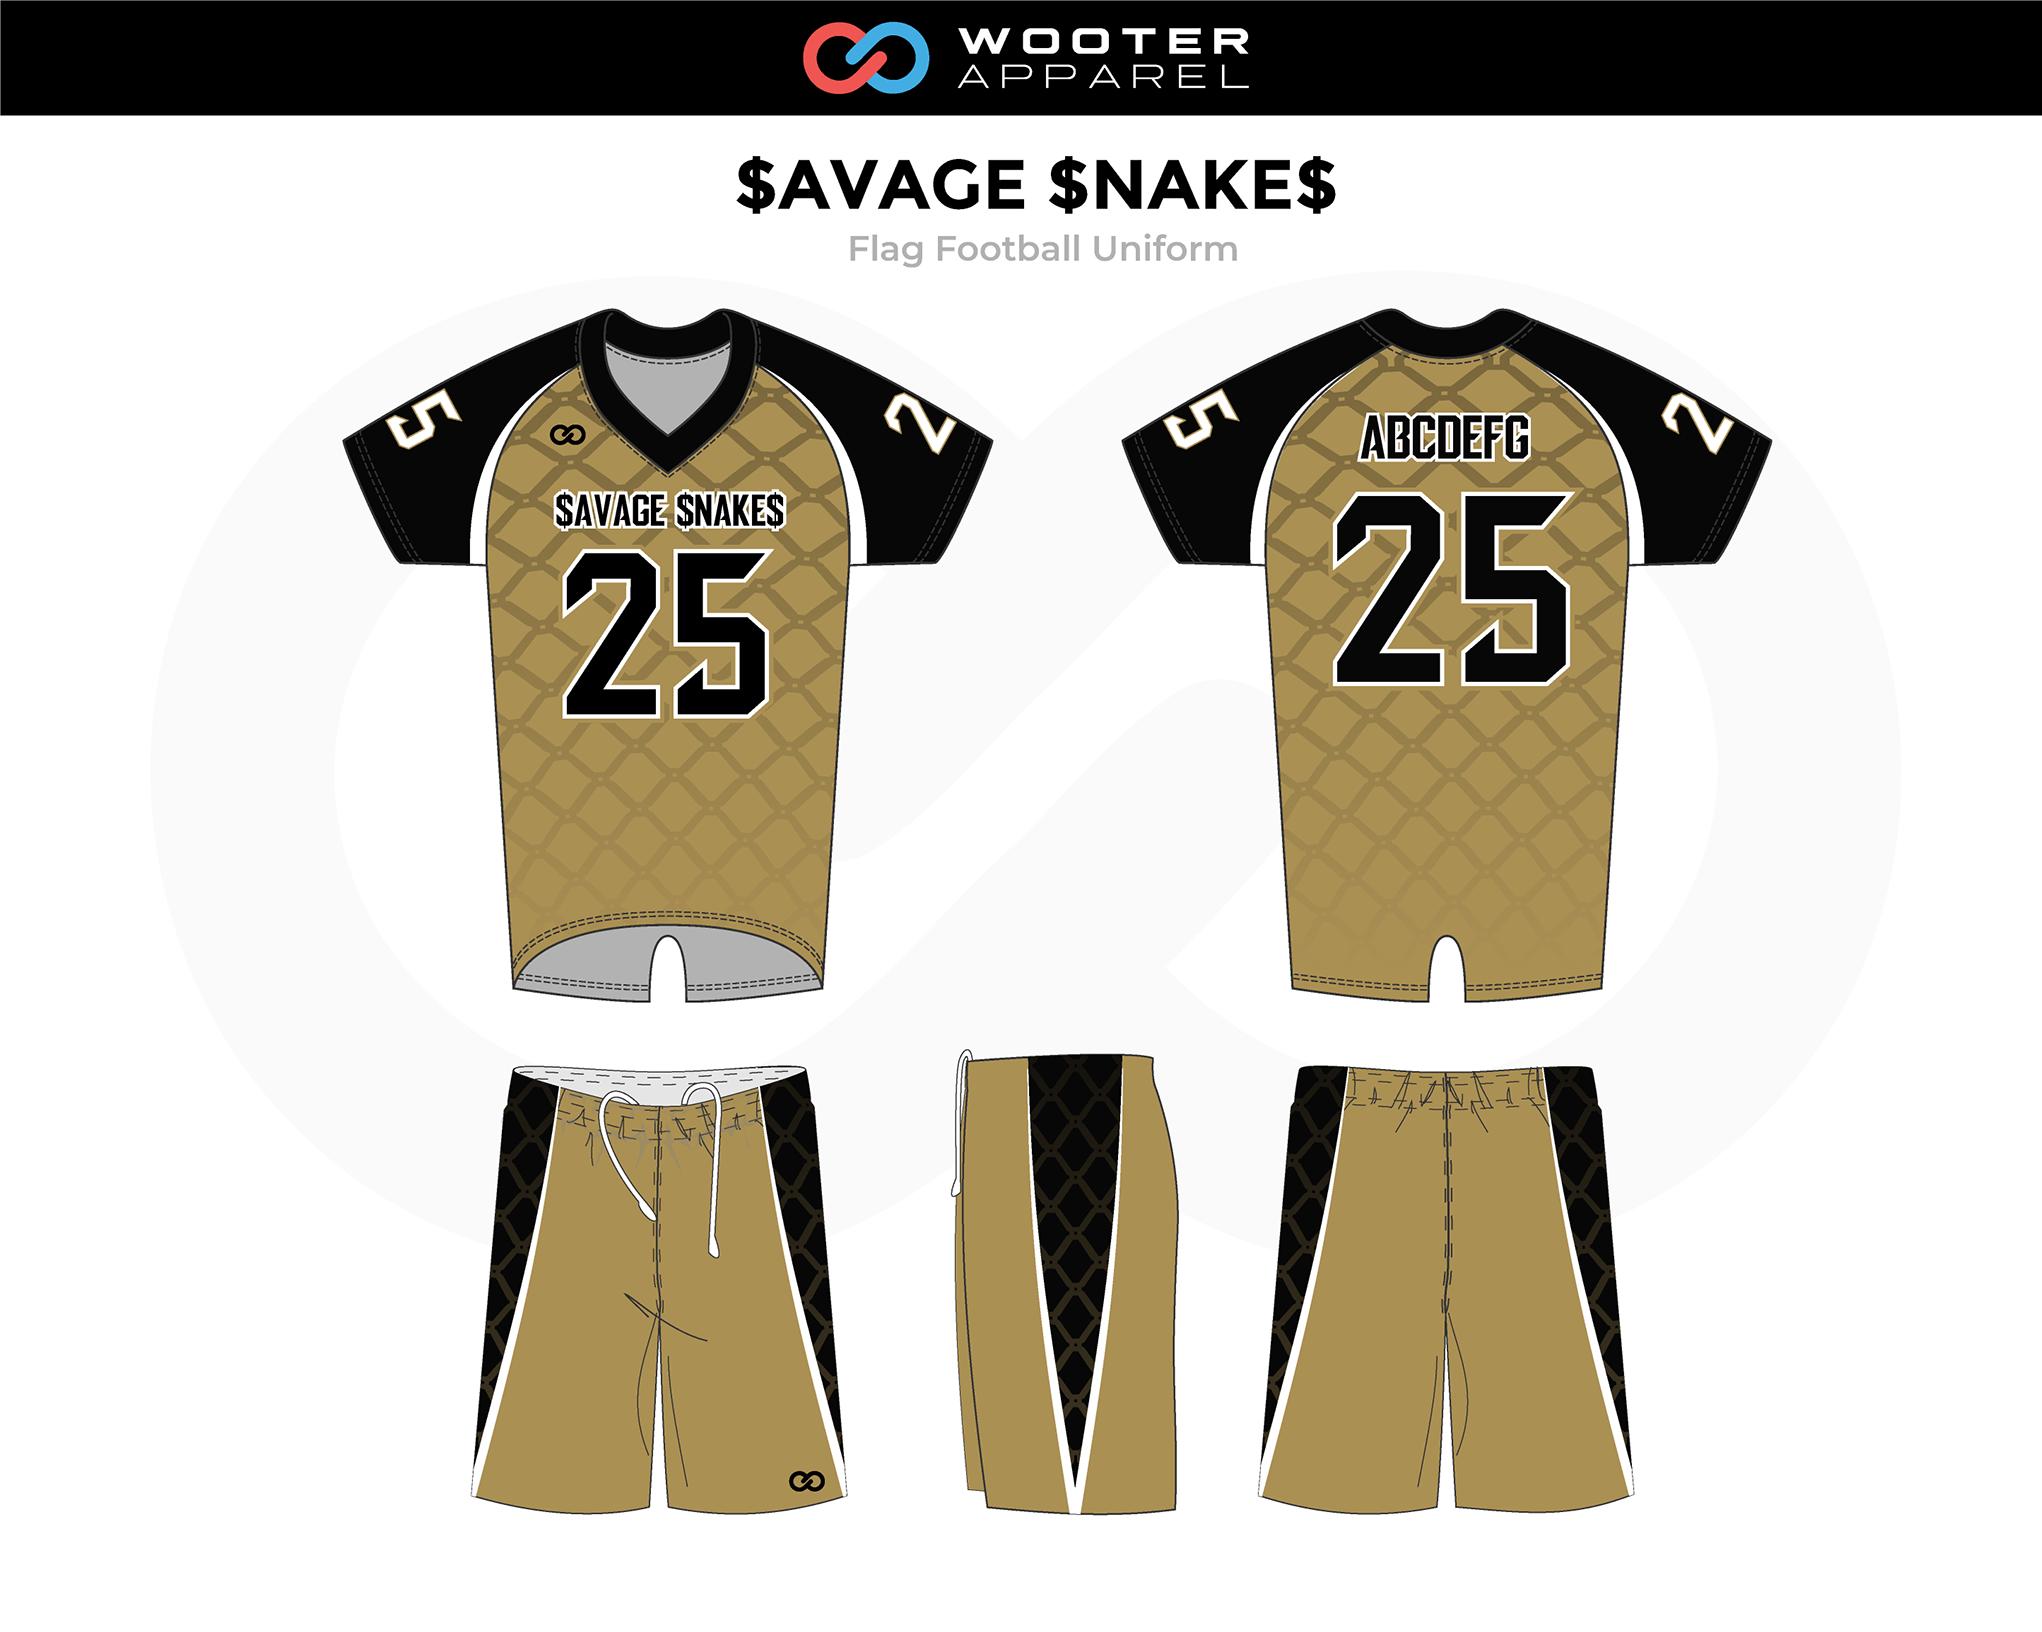 2018-11-16 $AVAGE $NAKE$ Flag Football Uniform B.png